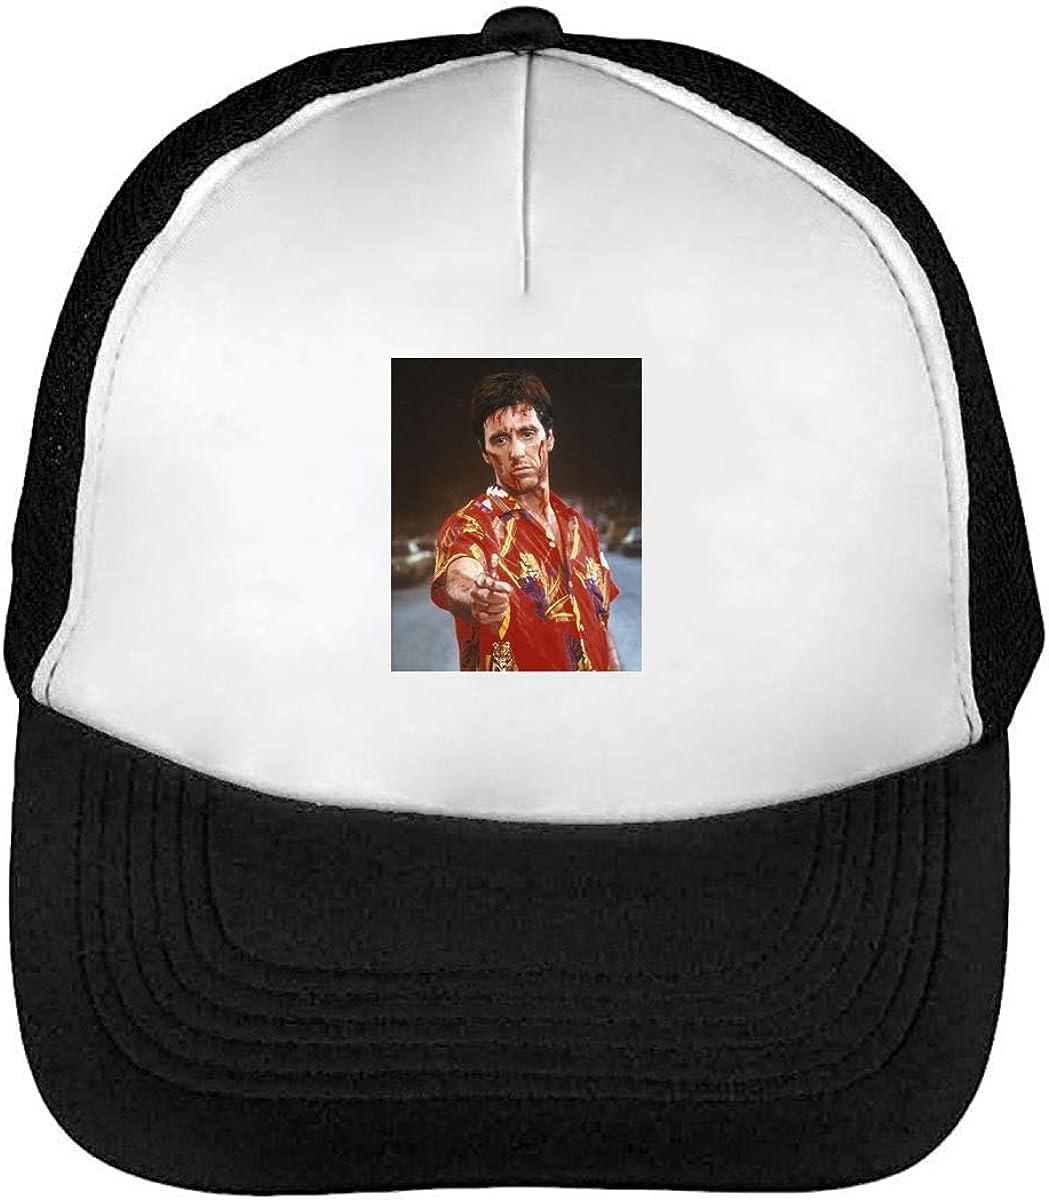 Tony Montana Artwork Gorra de Béisbol Camionero Unisex: Amazon.es ...